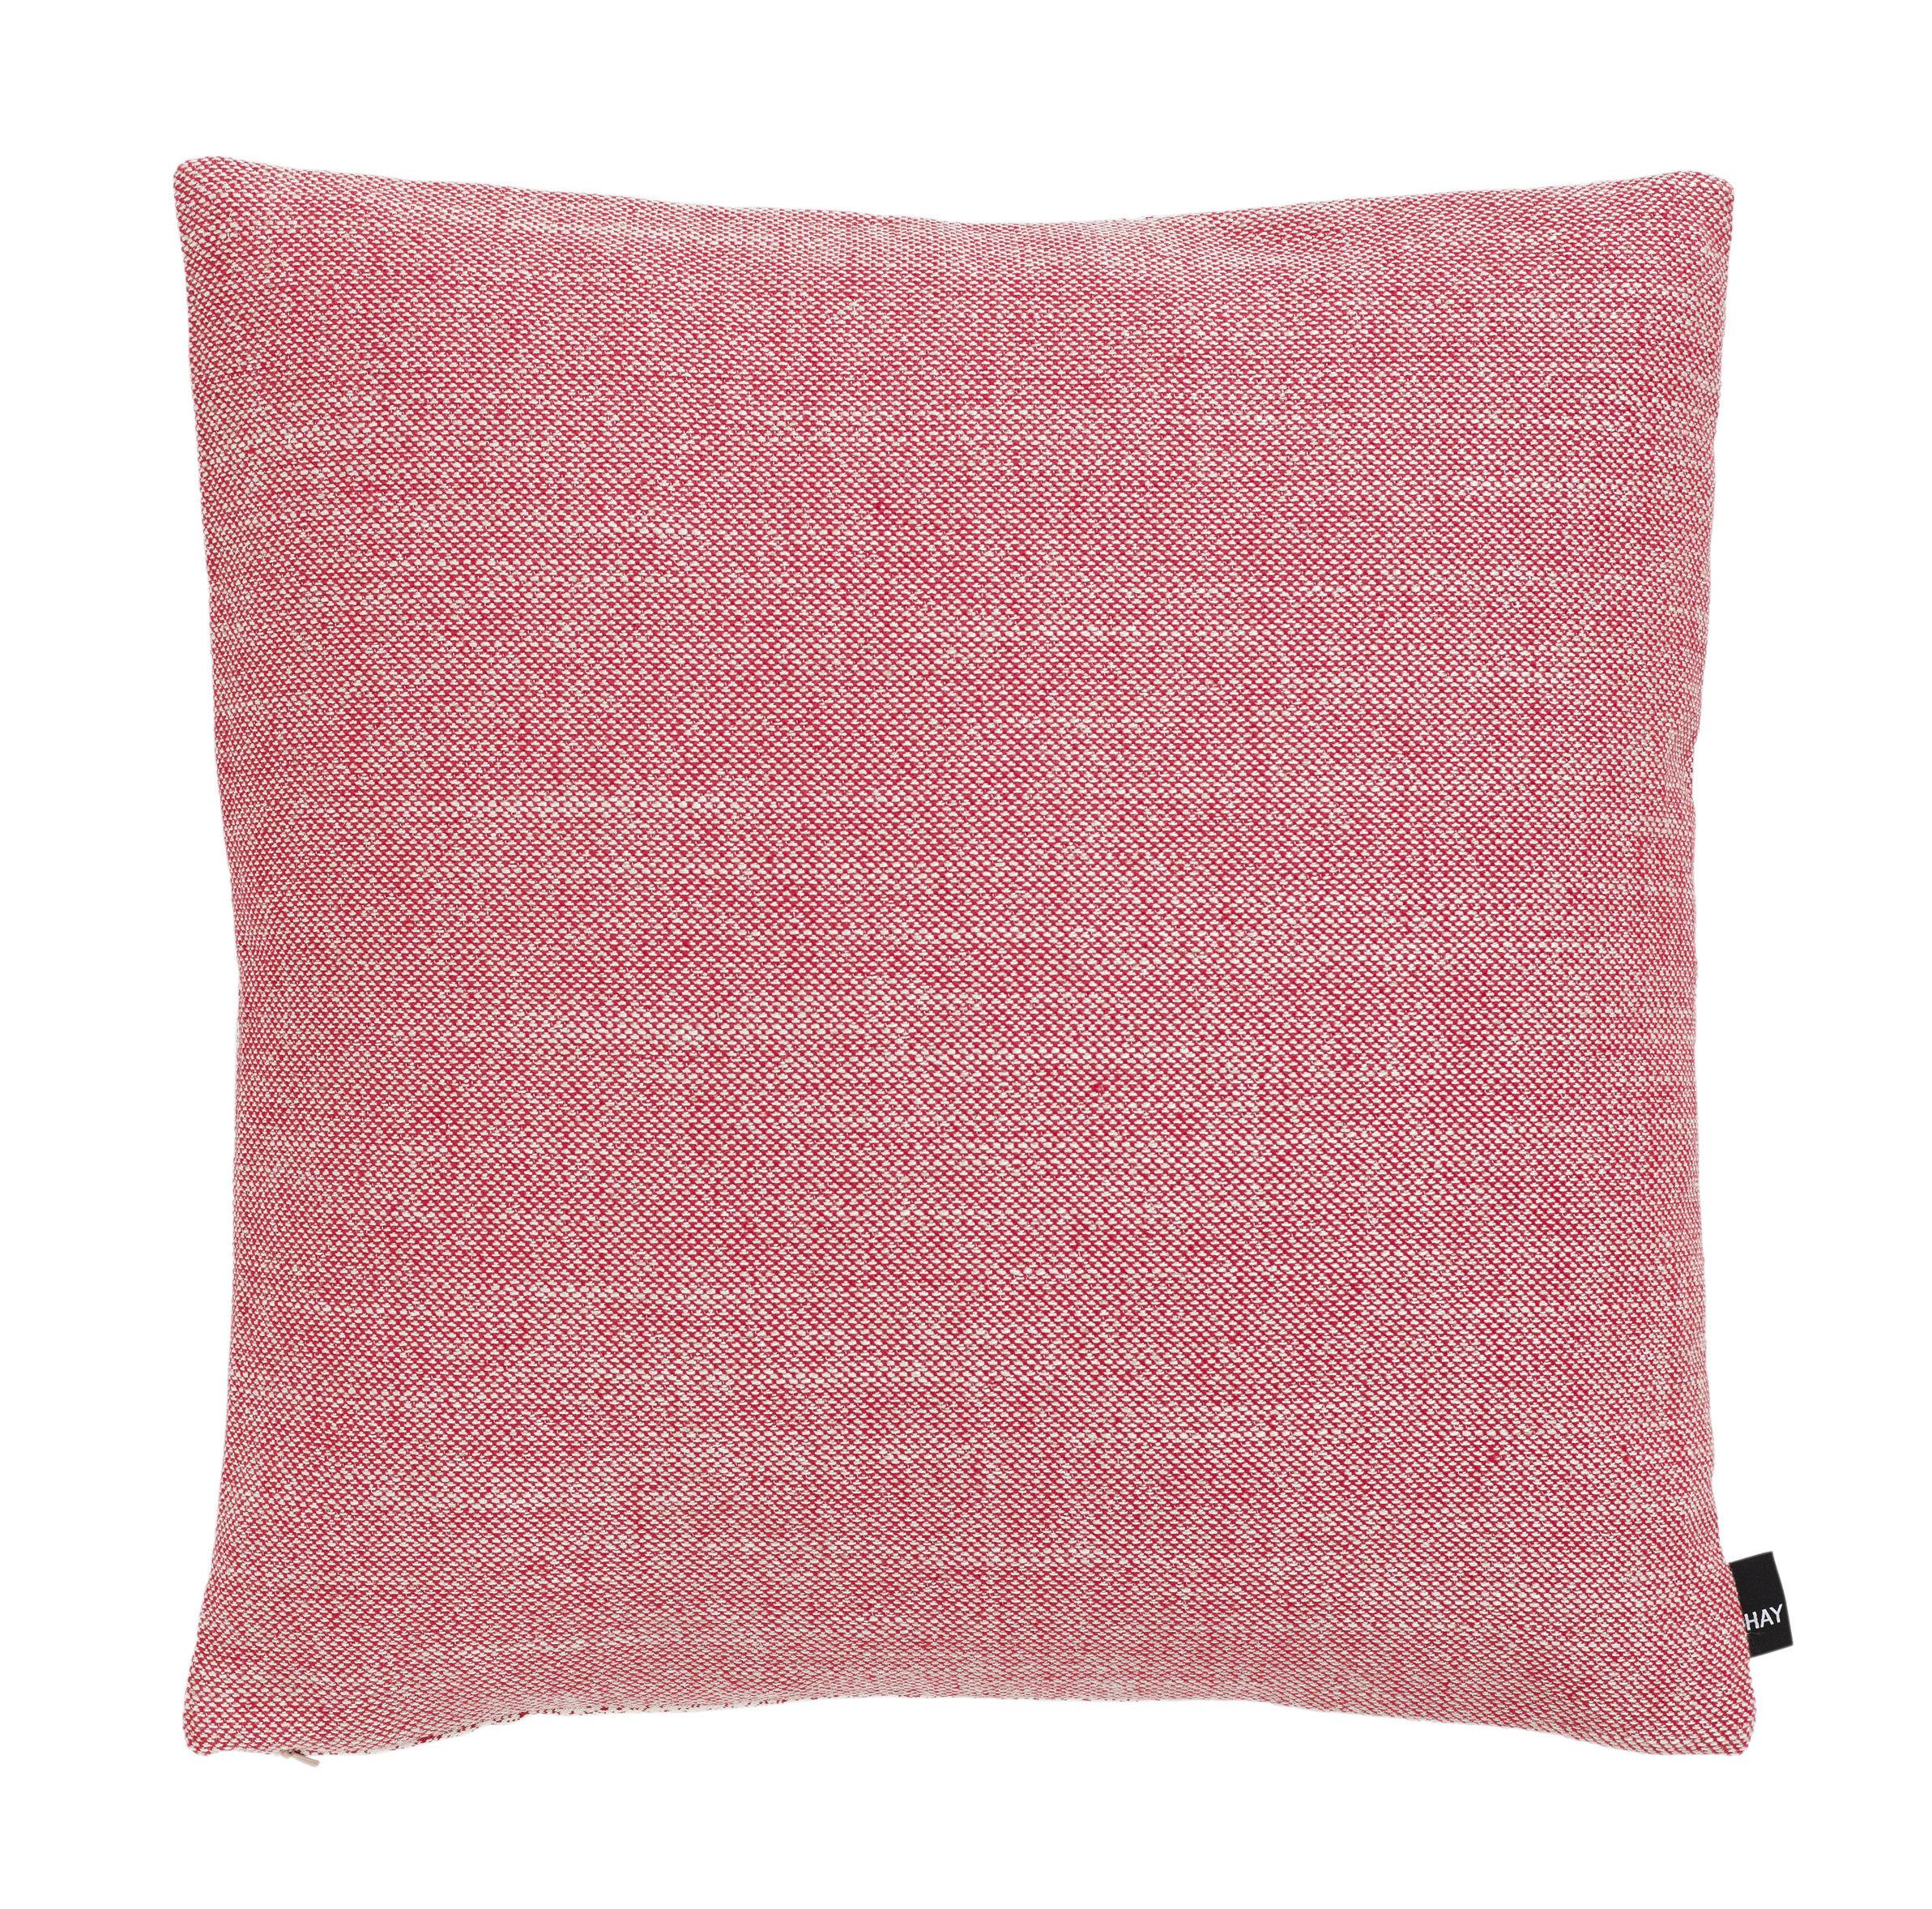 kissen eclectic von hay rosa made in design. Black Bedroom Furniture Sets. Home Design Ideas